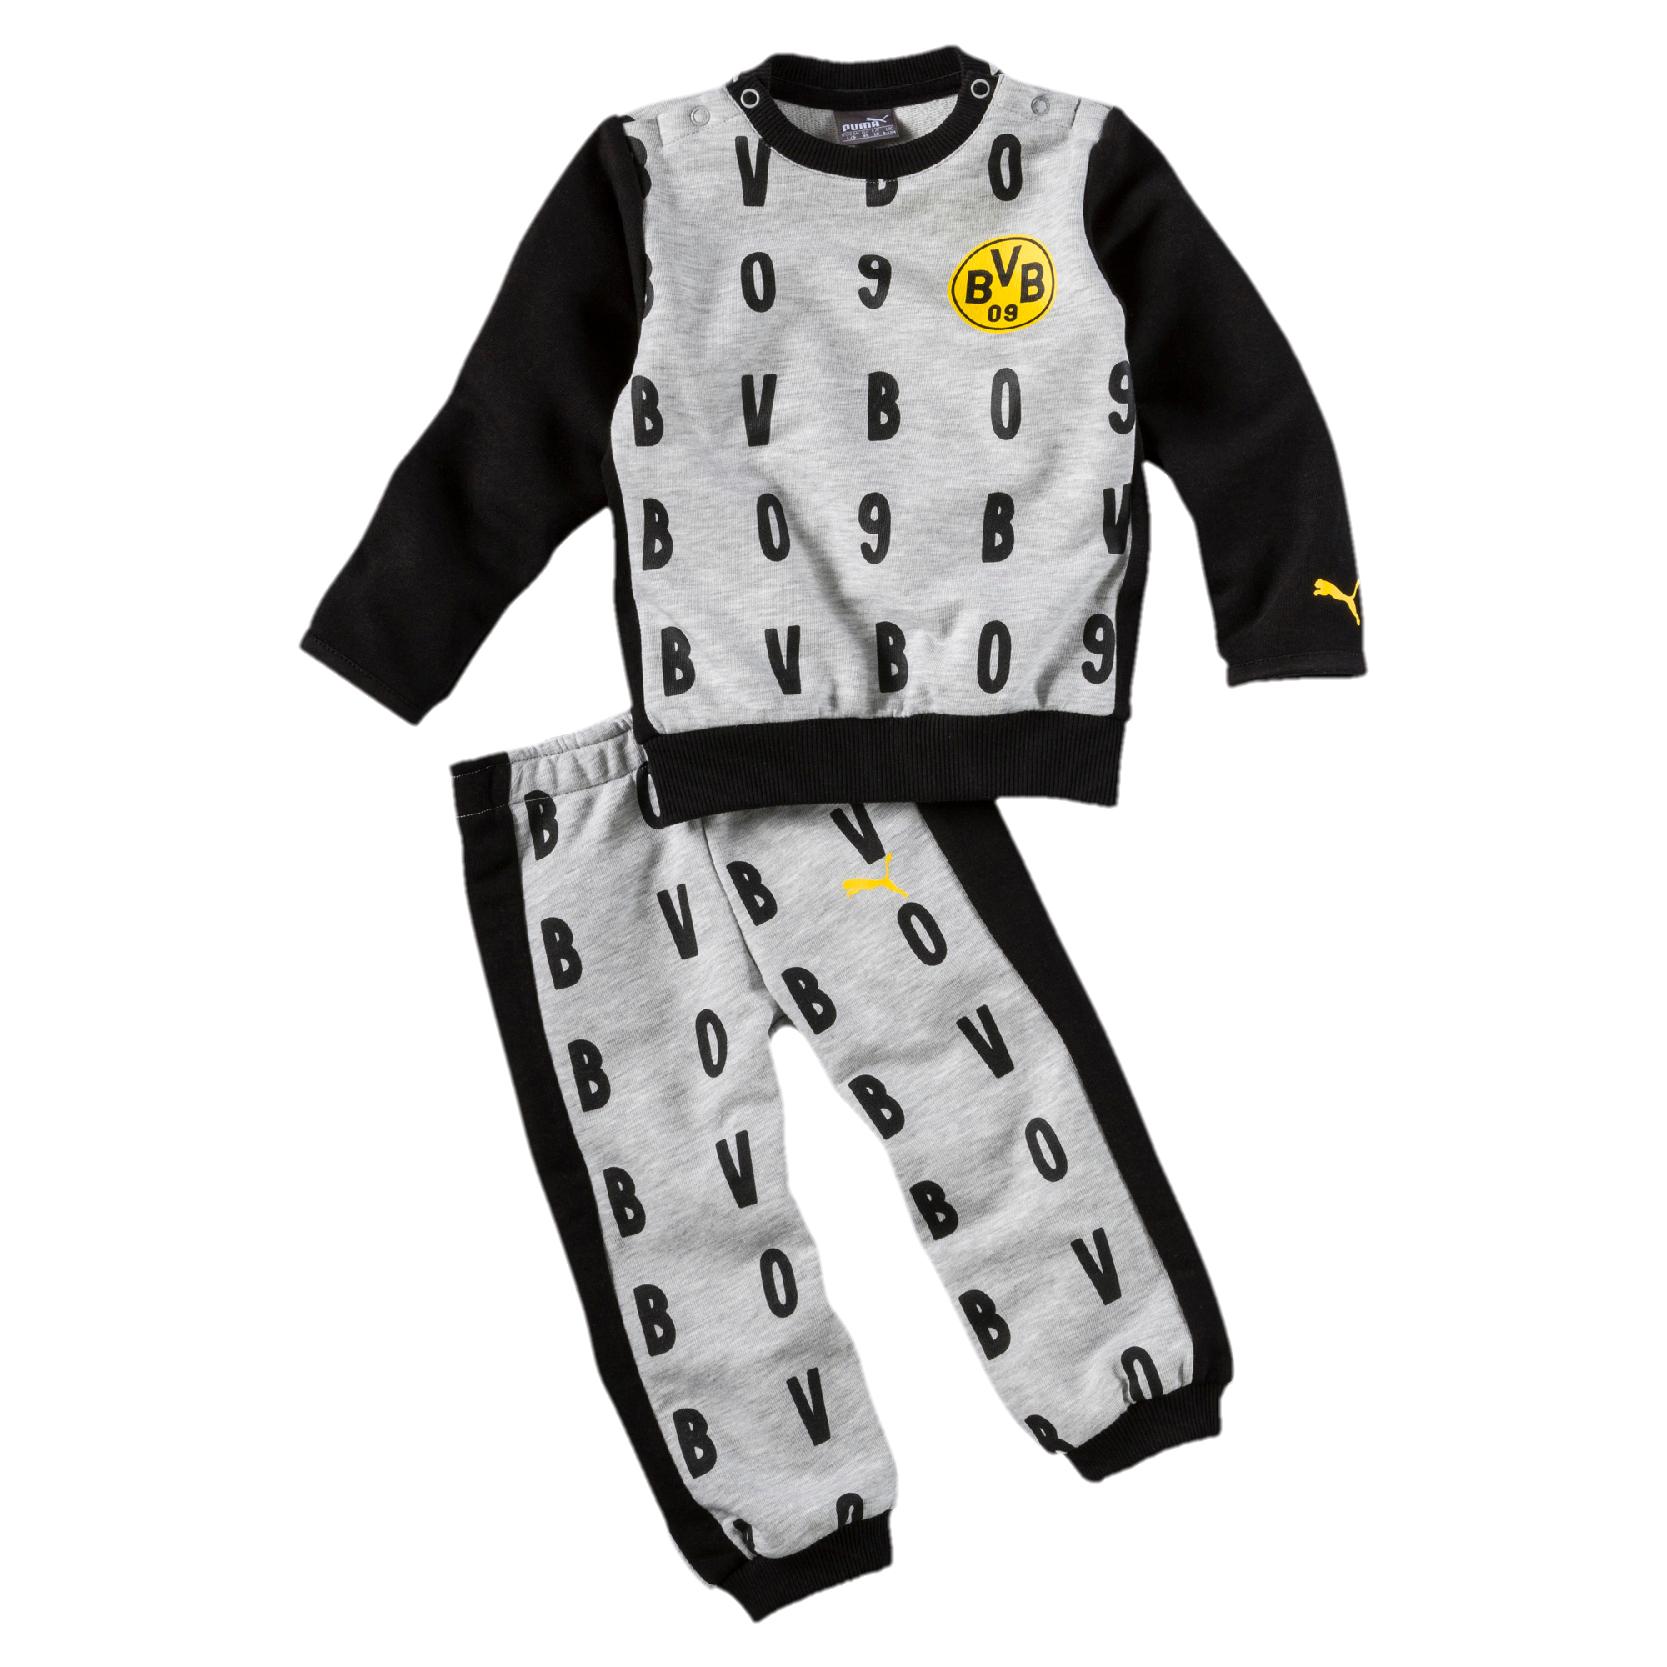 Puma BVB Borussia Dortmund - Minicats Kinder Jogger Jogginanzug in Größe 56 bis 102